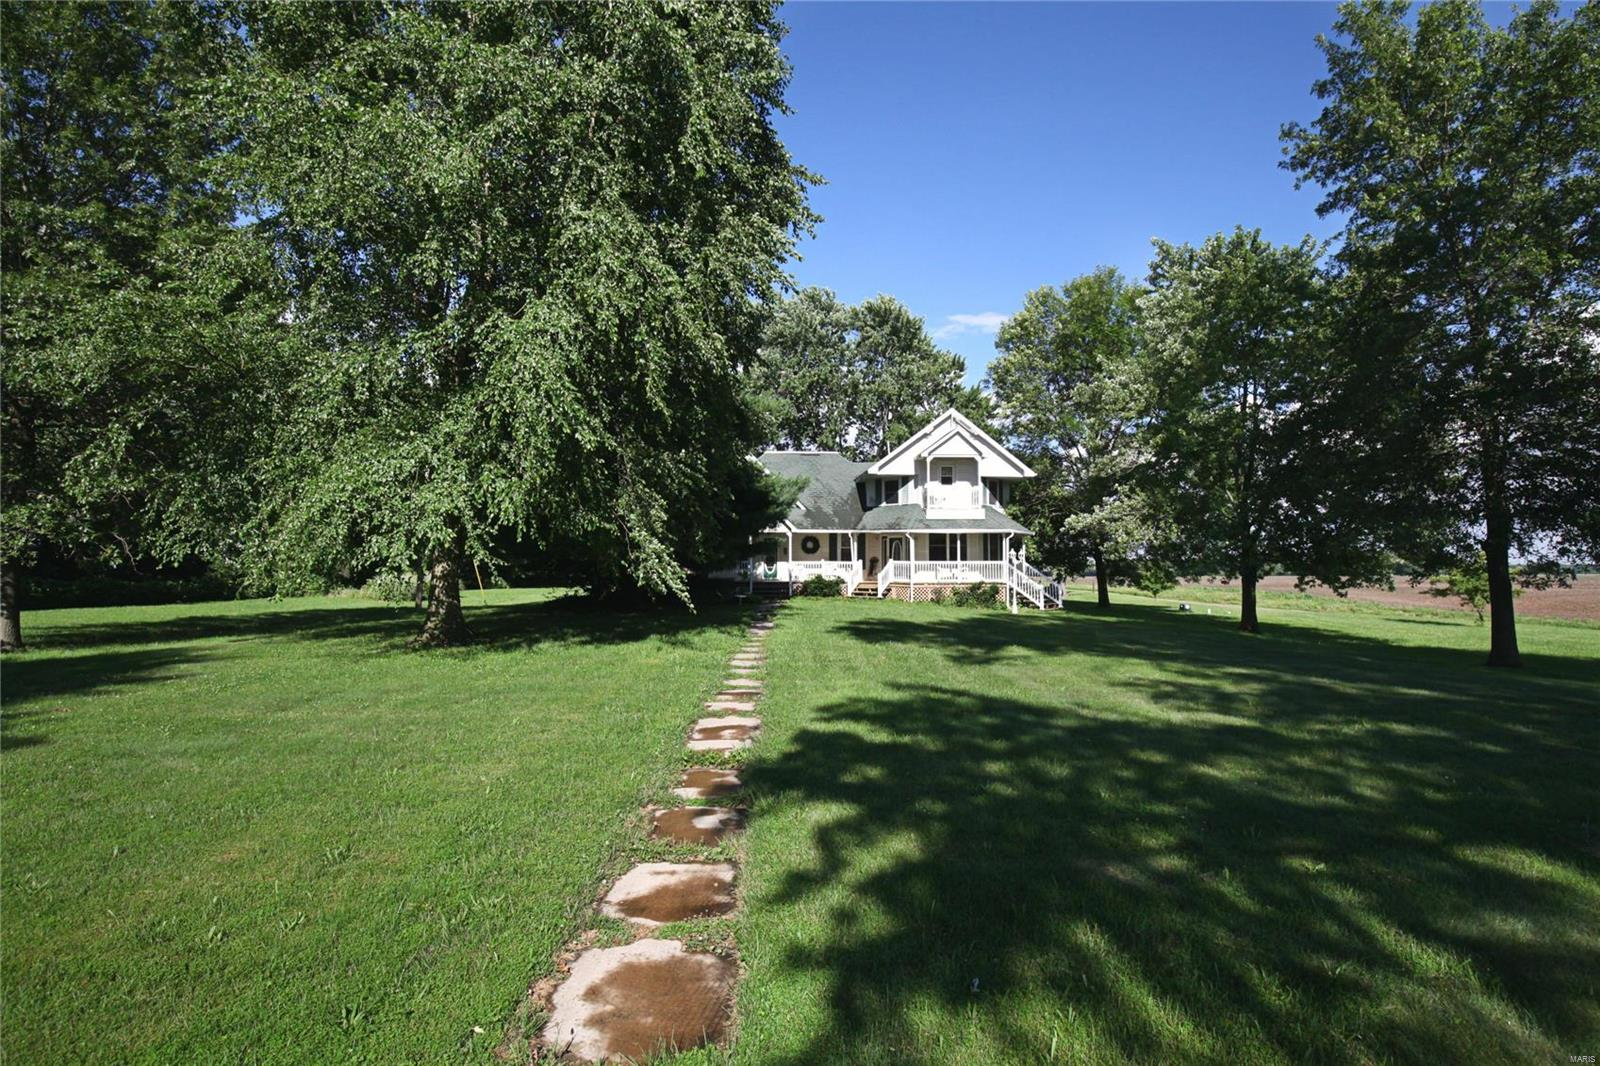 2074 North 425 Street Property Photo - Vandalia, IL real estate listing